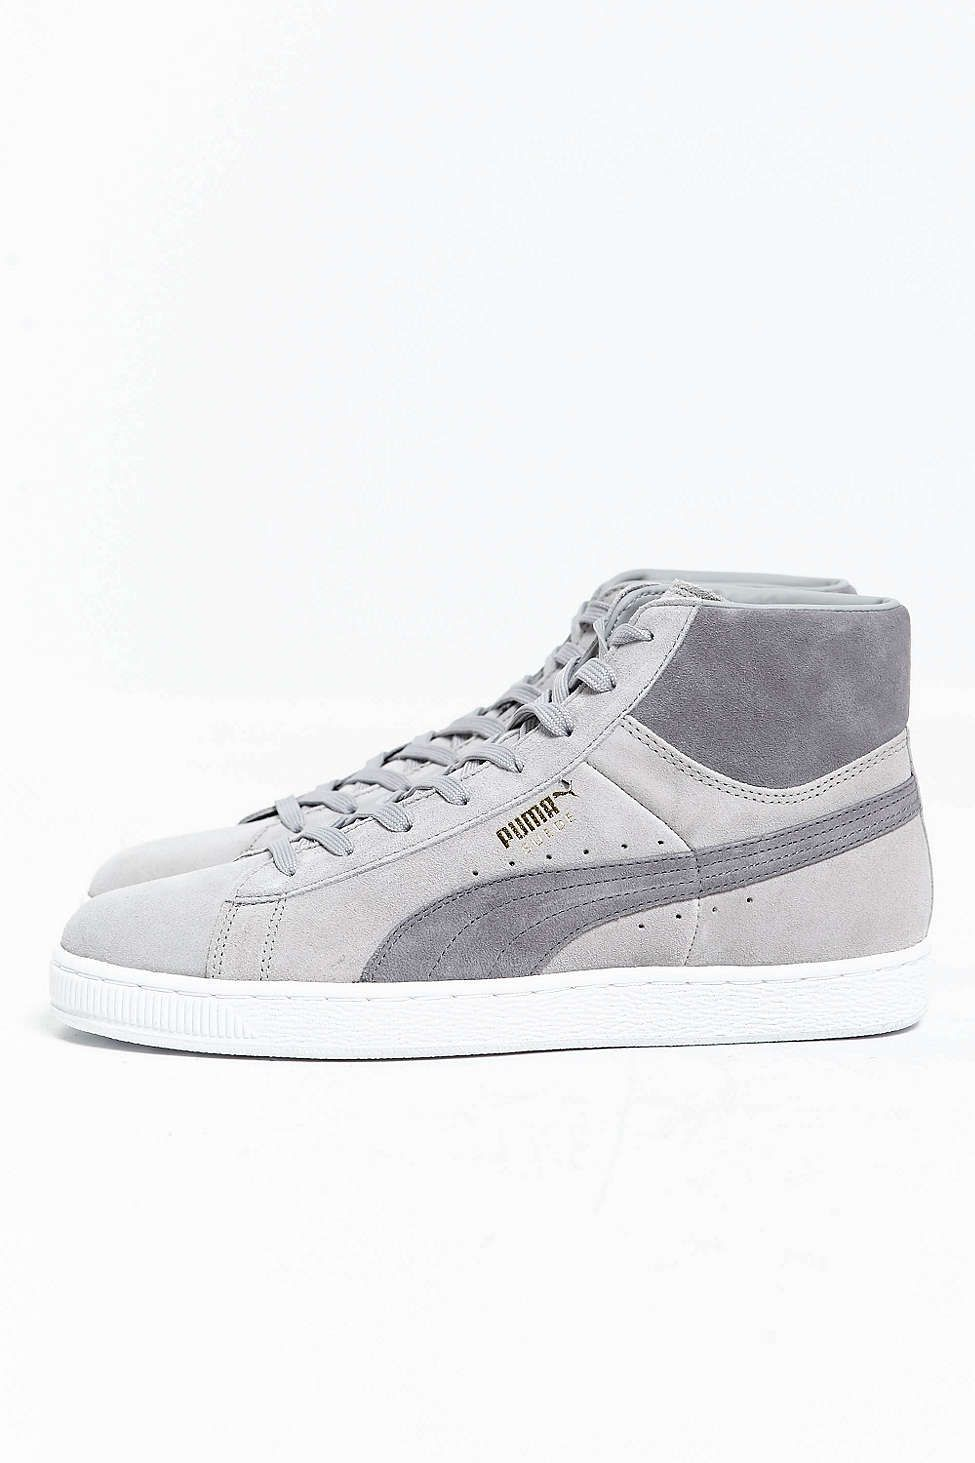 PUMA Men's Suede Mid Classic Sneaker Fashion Sneakers